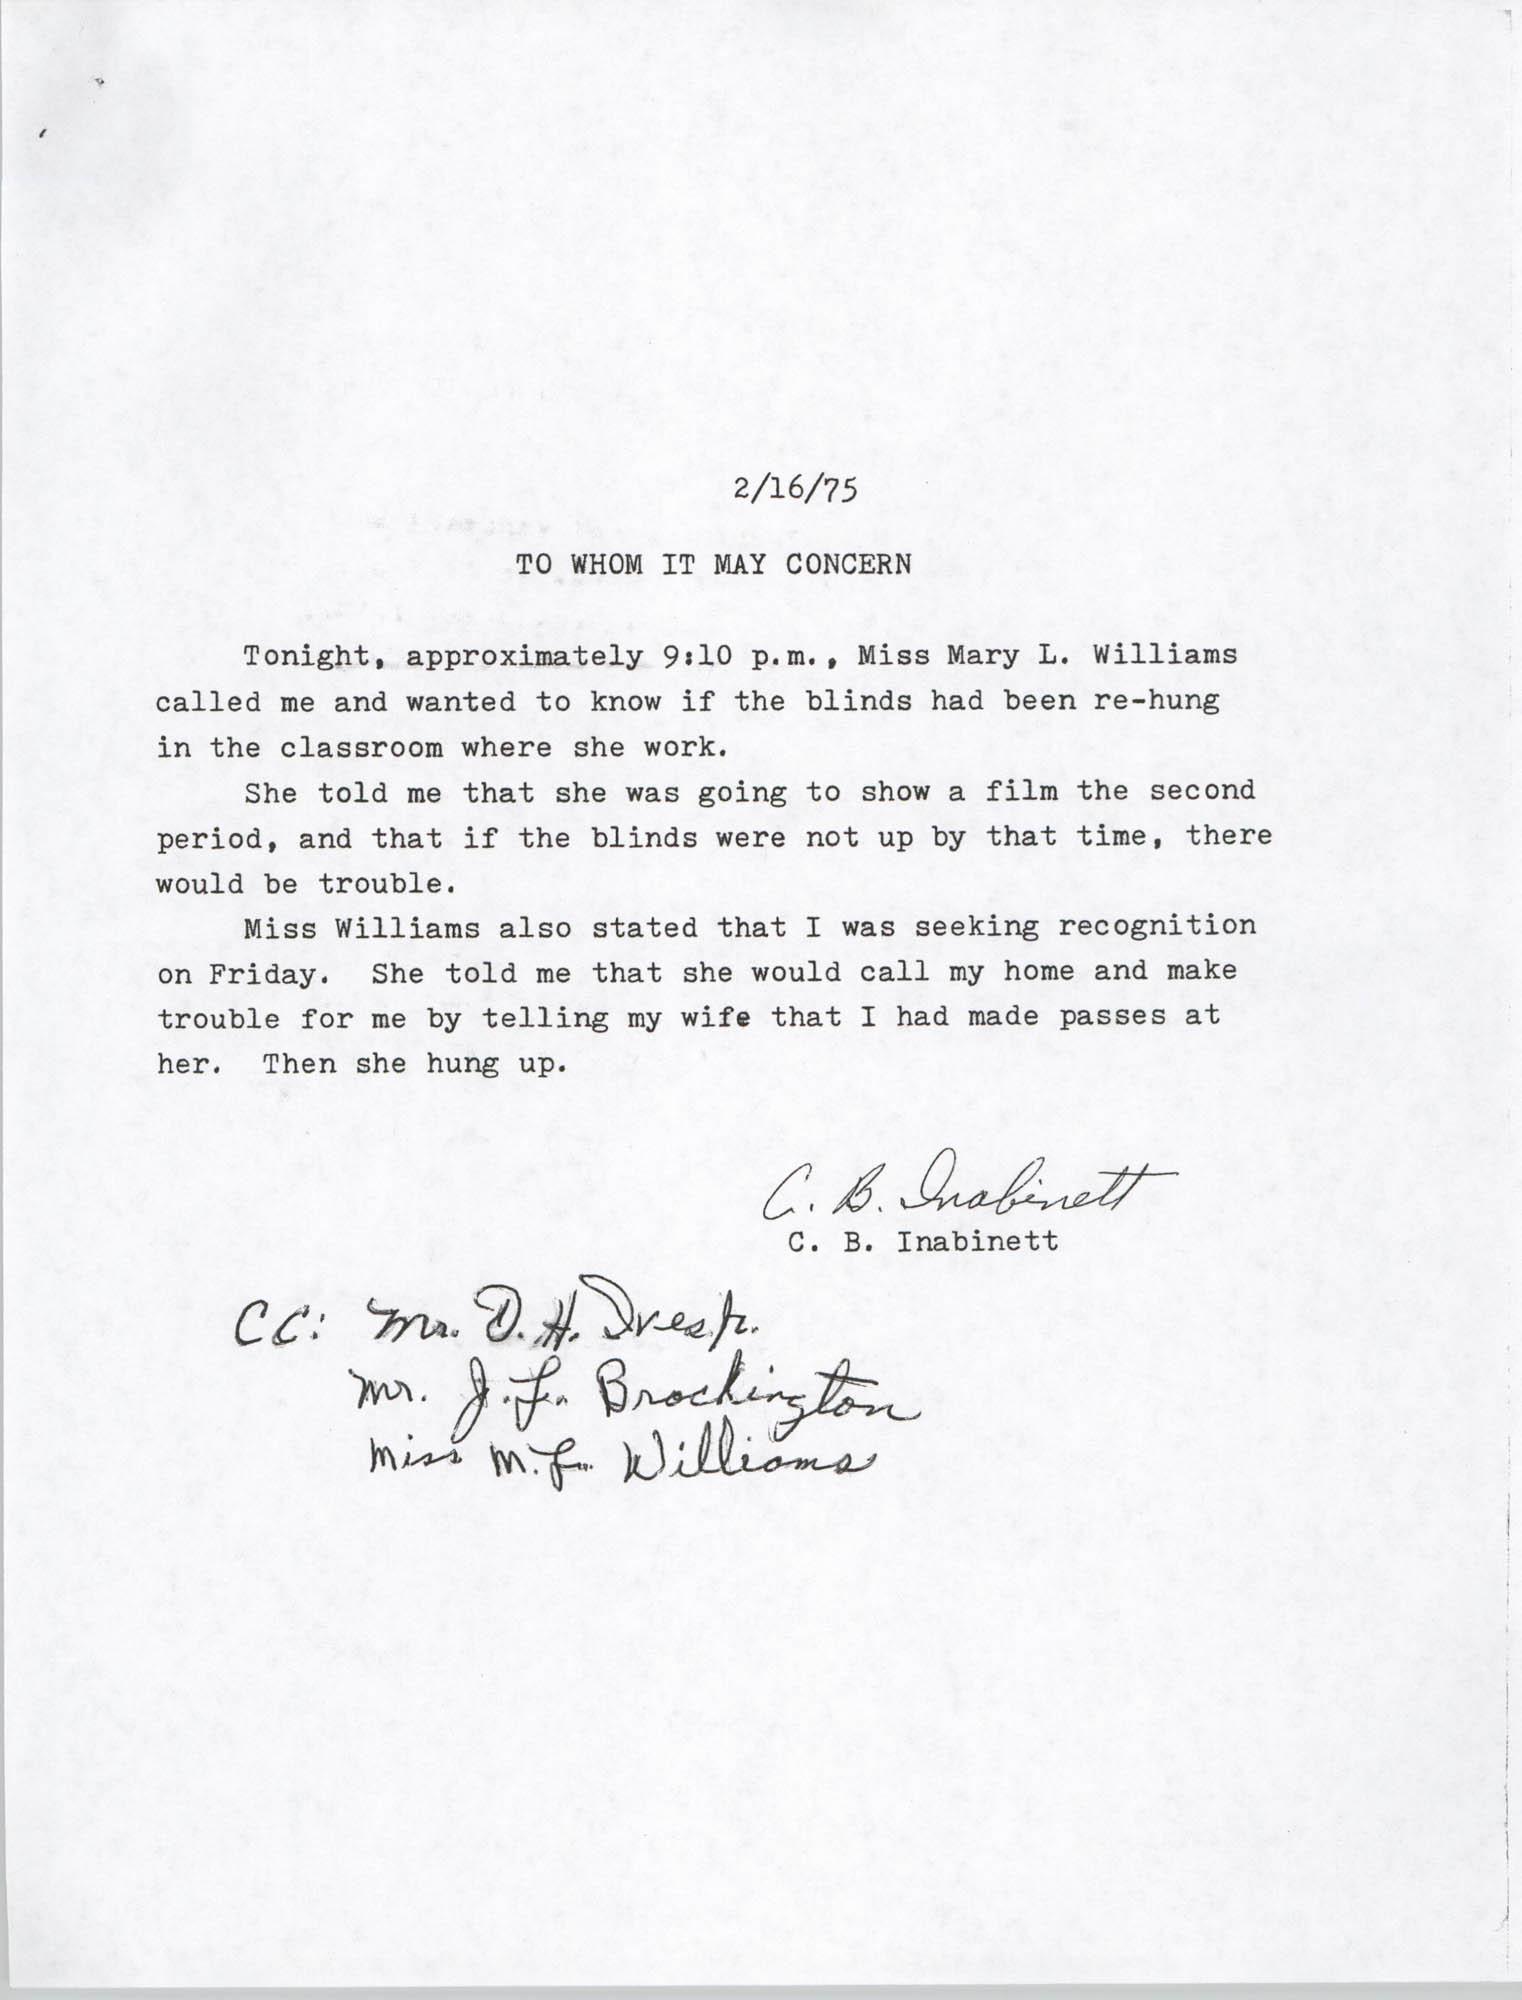 Letter from C. B. Inabinett, February 16, 1975